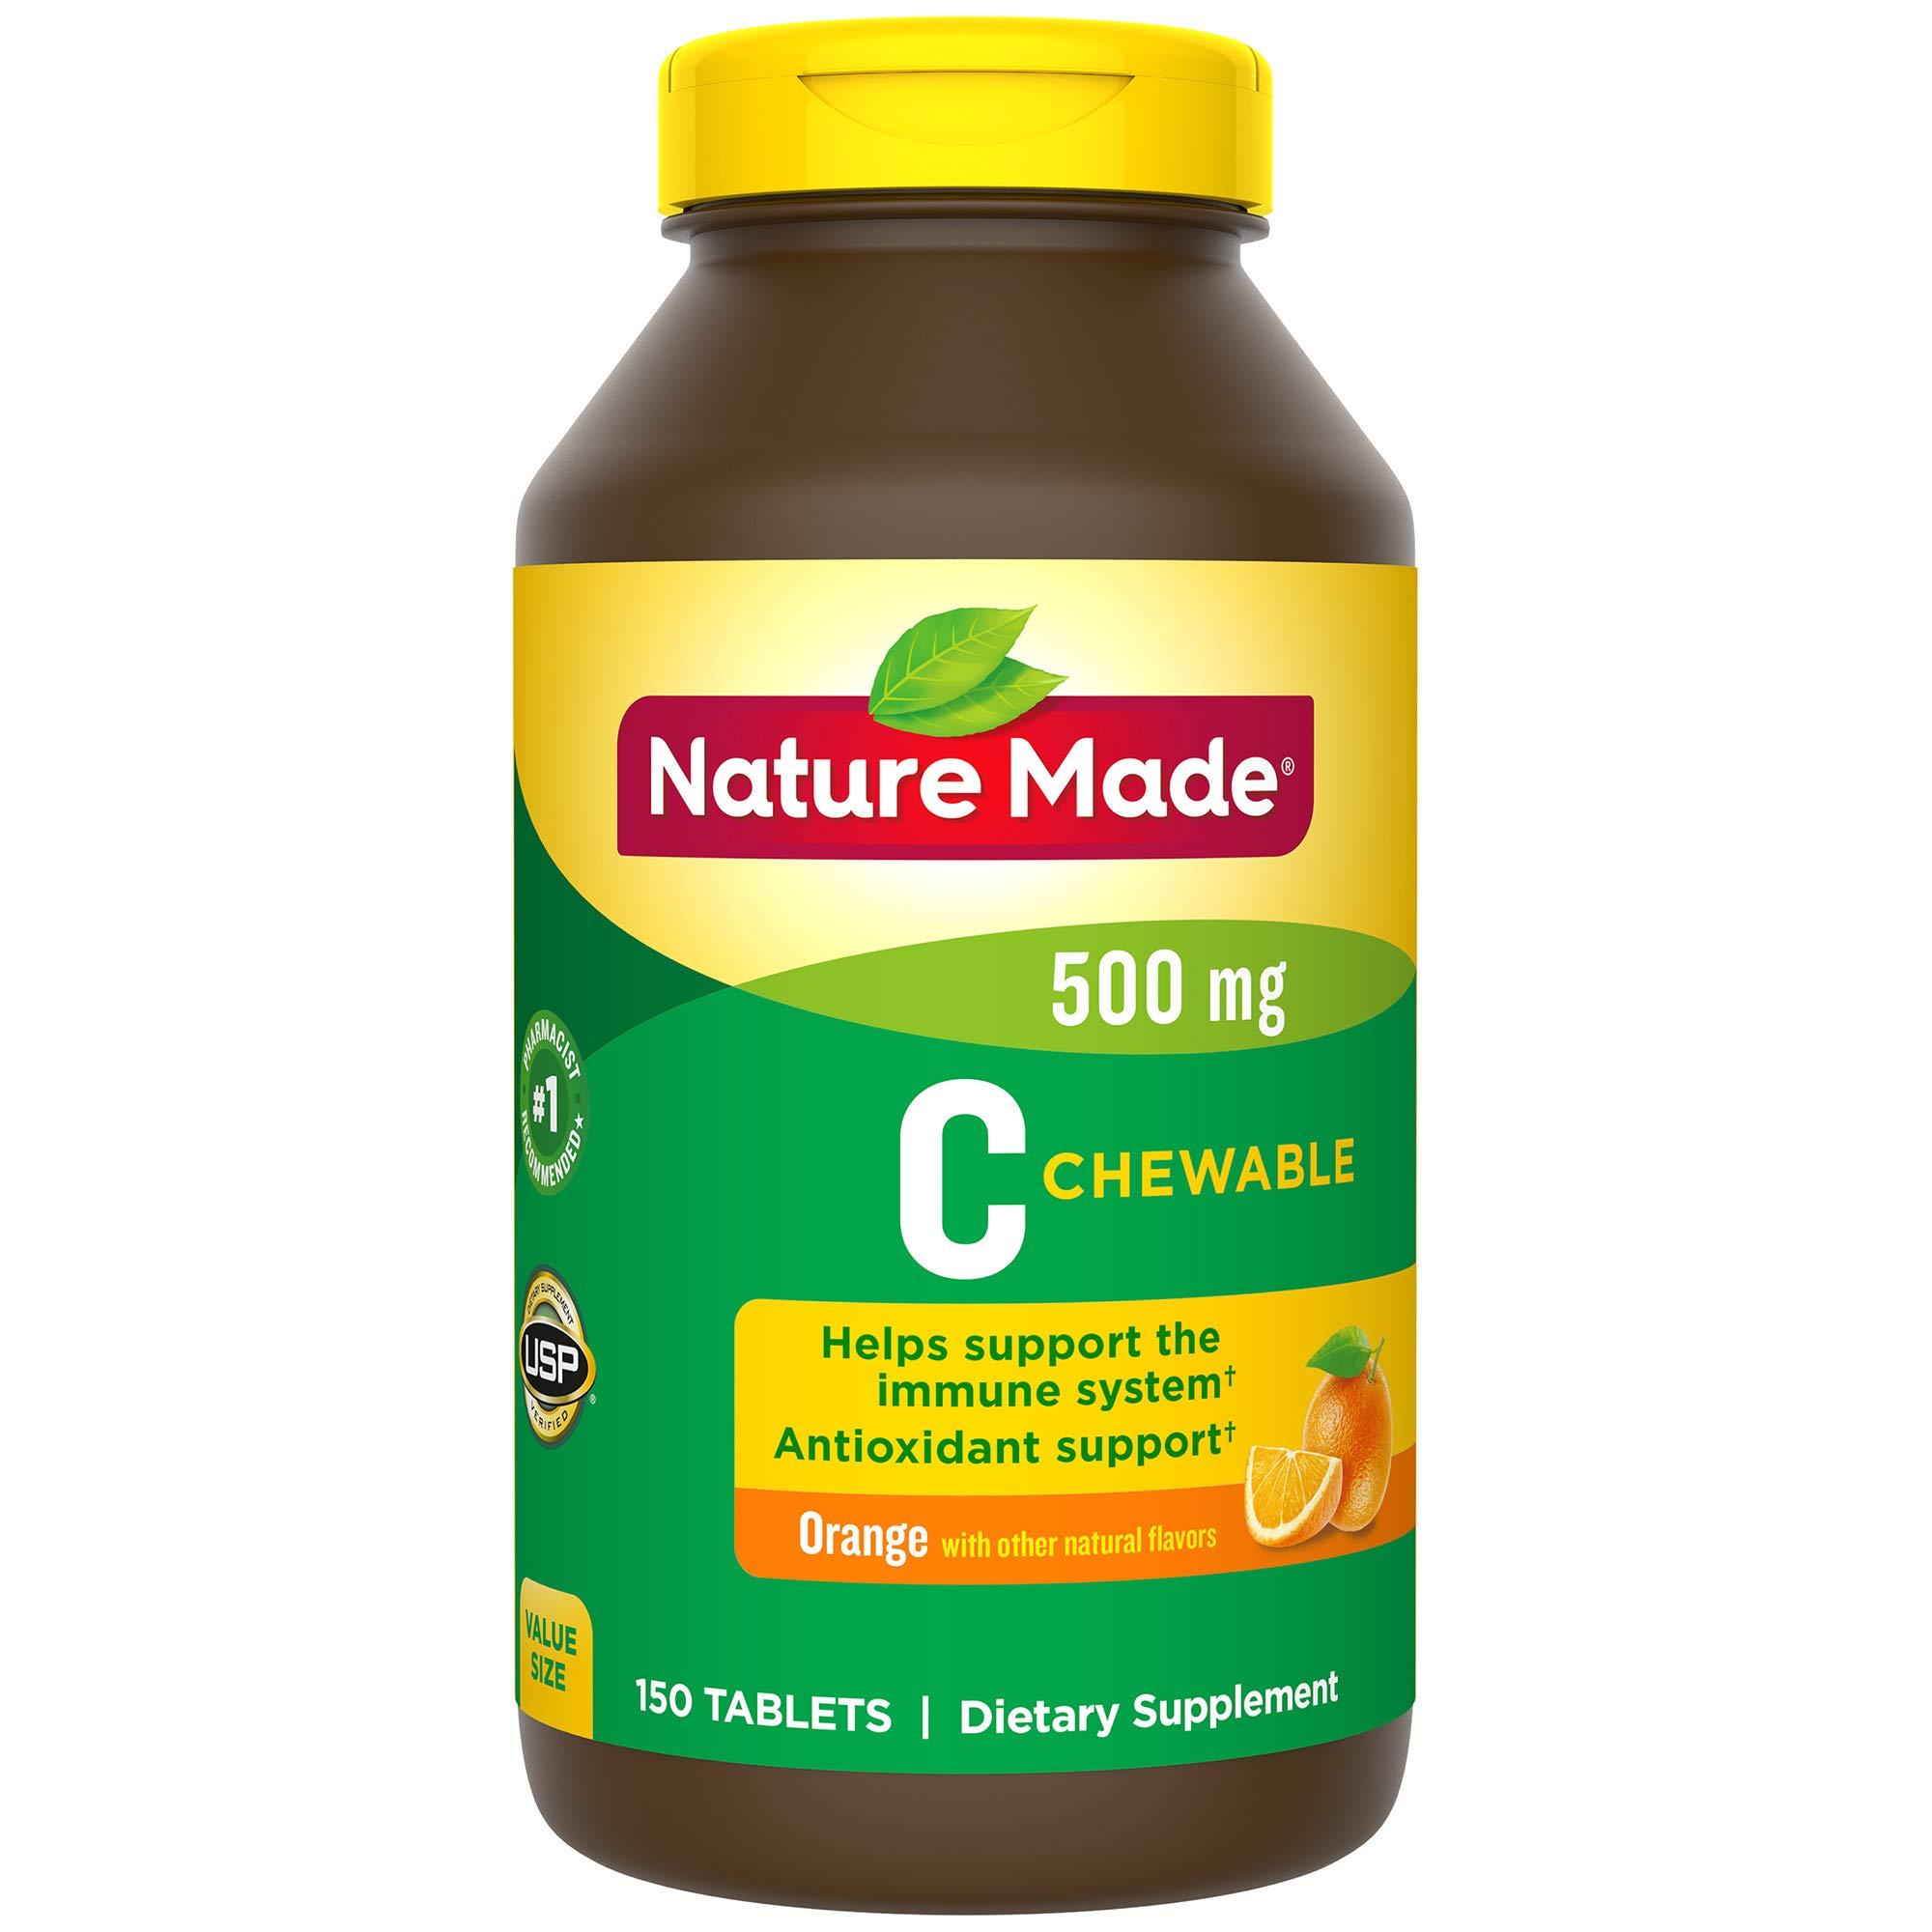 Nature Made Chewable Vitamin C 500 mg